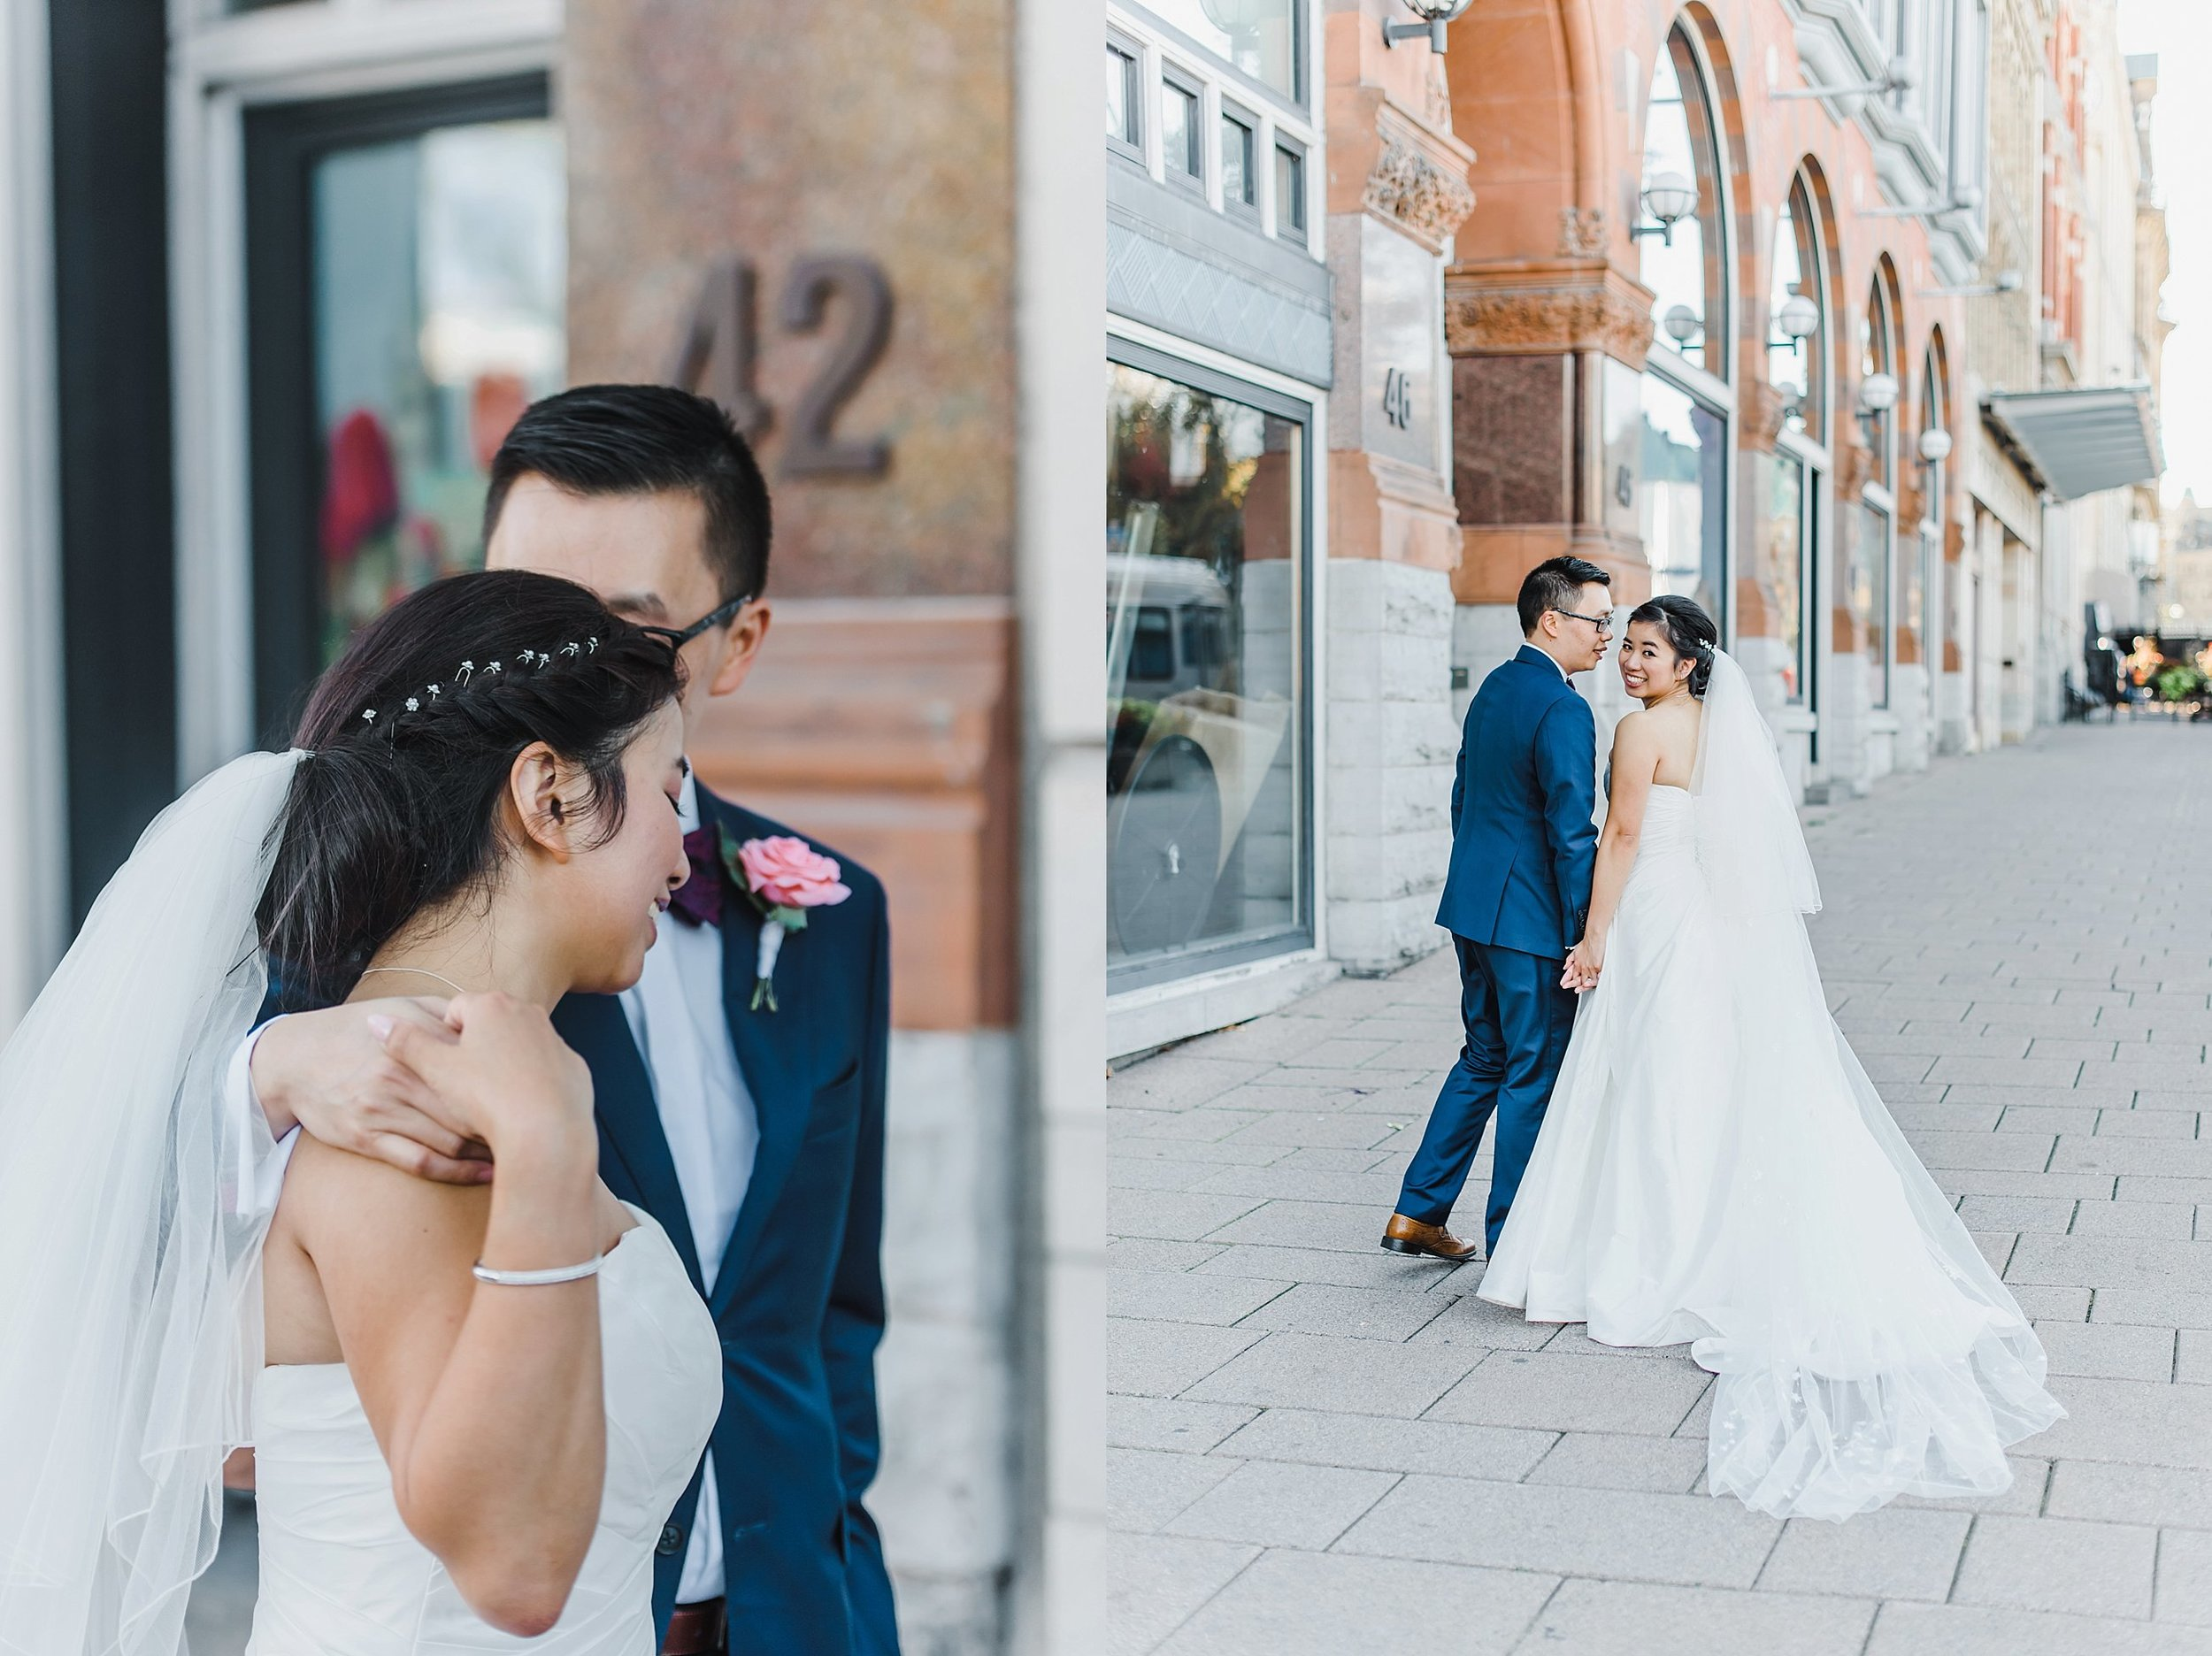 light airy indie fine art ottawa wedding photographer | Ali and Batoul Photography_1536.jpg